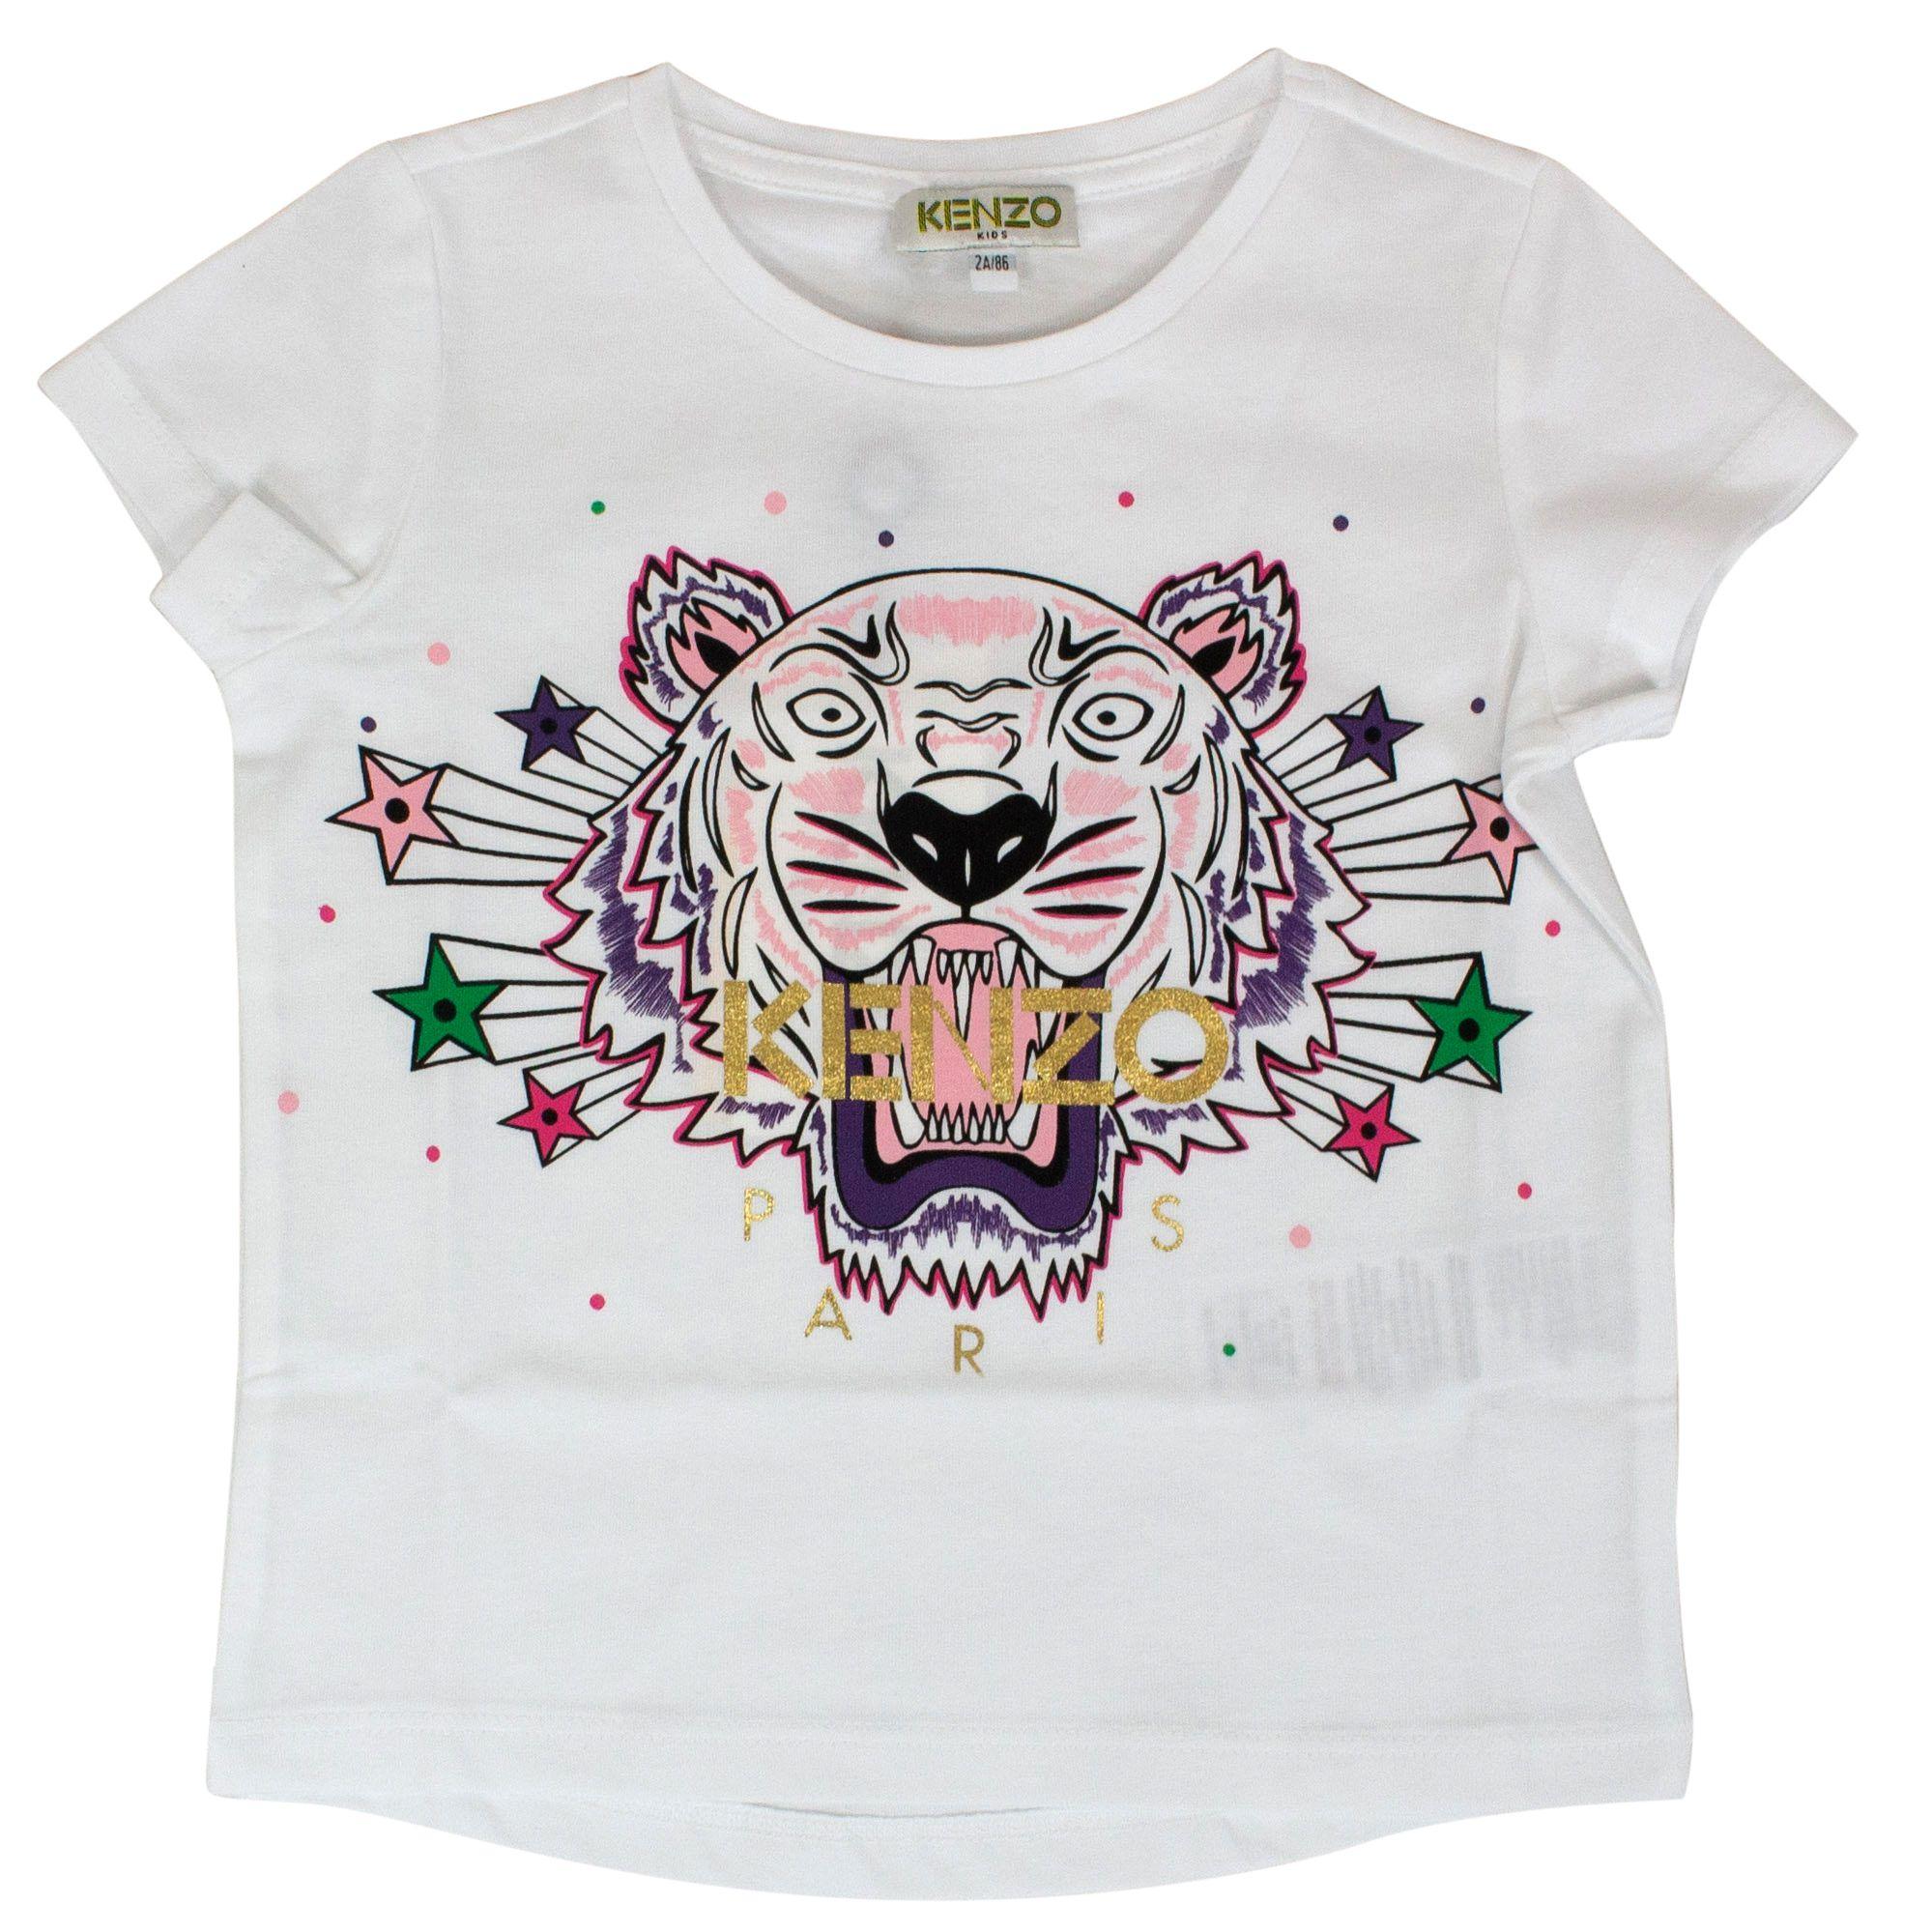 fda0029a Tiger print t-shirt with stars